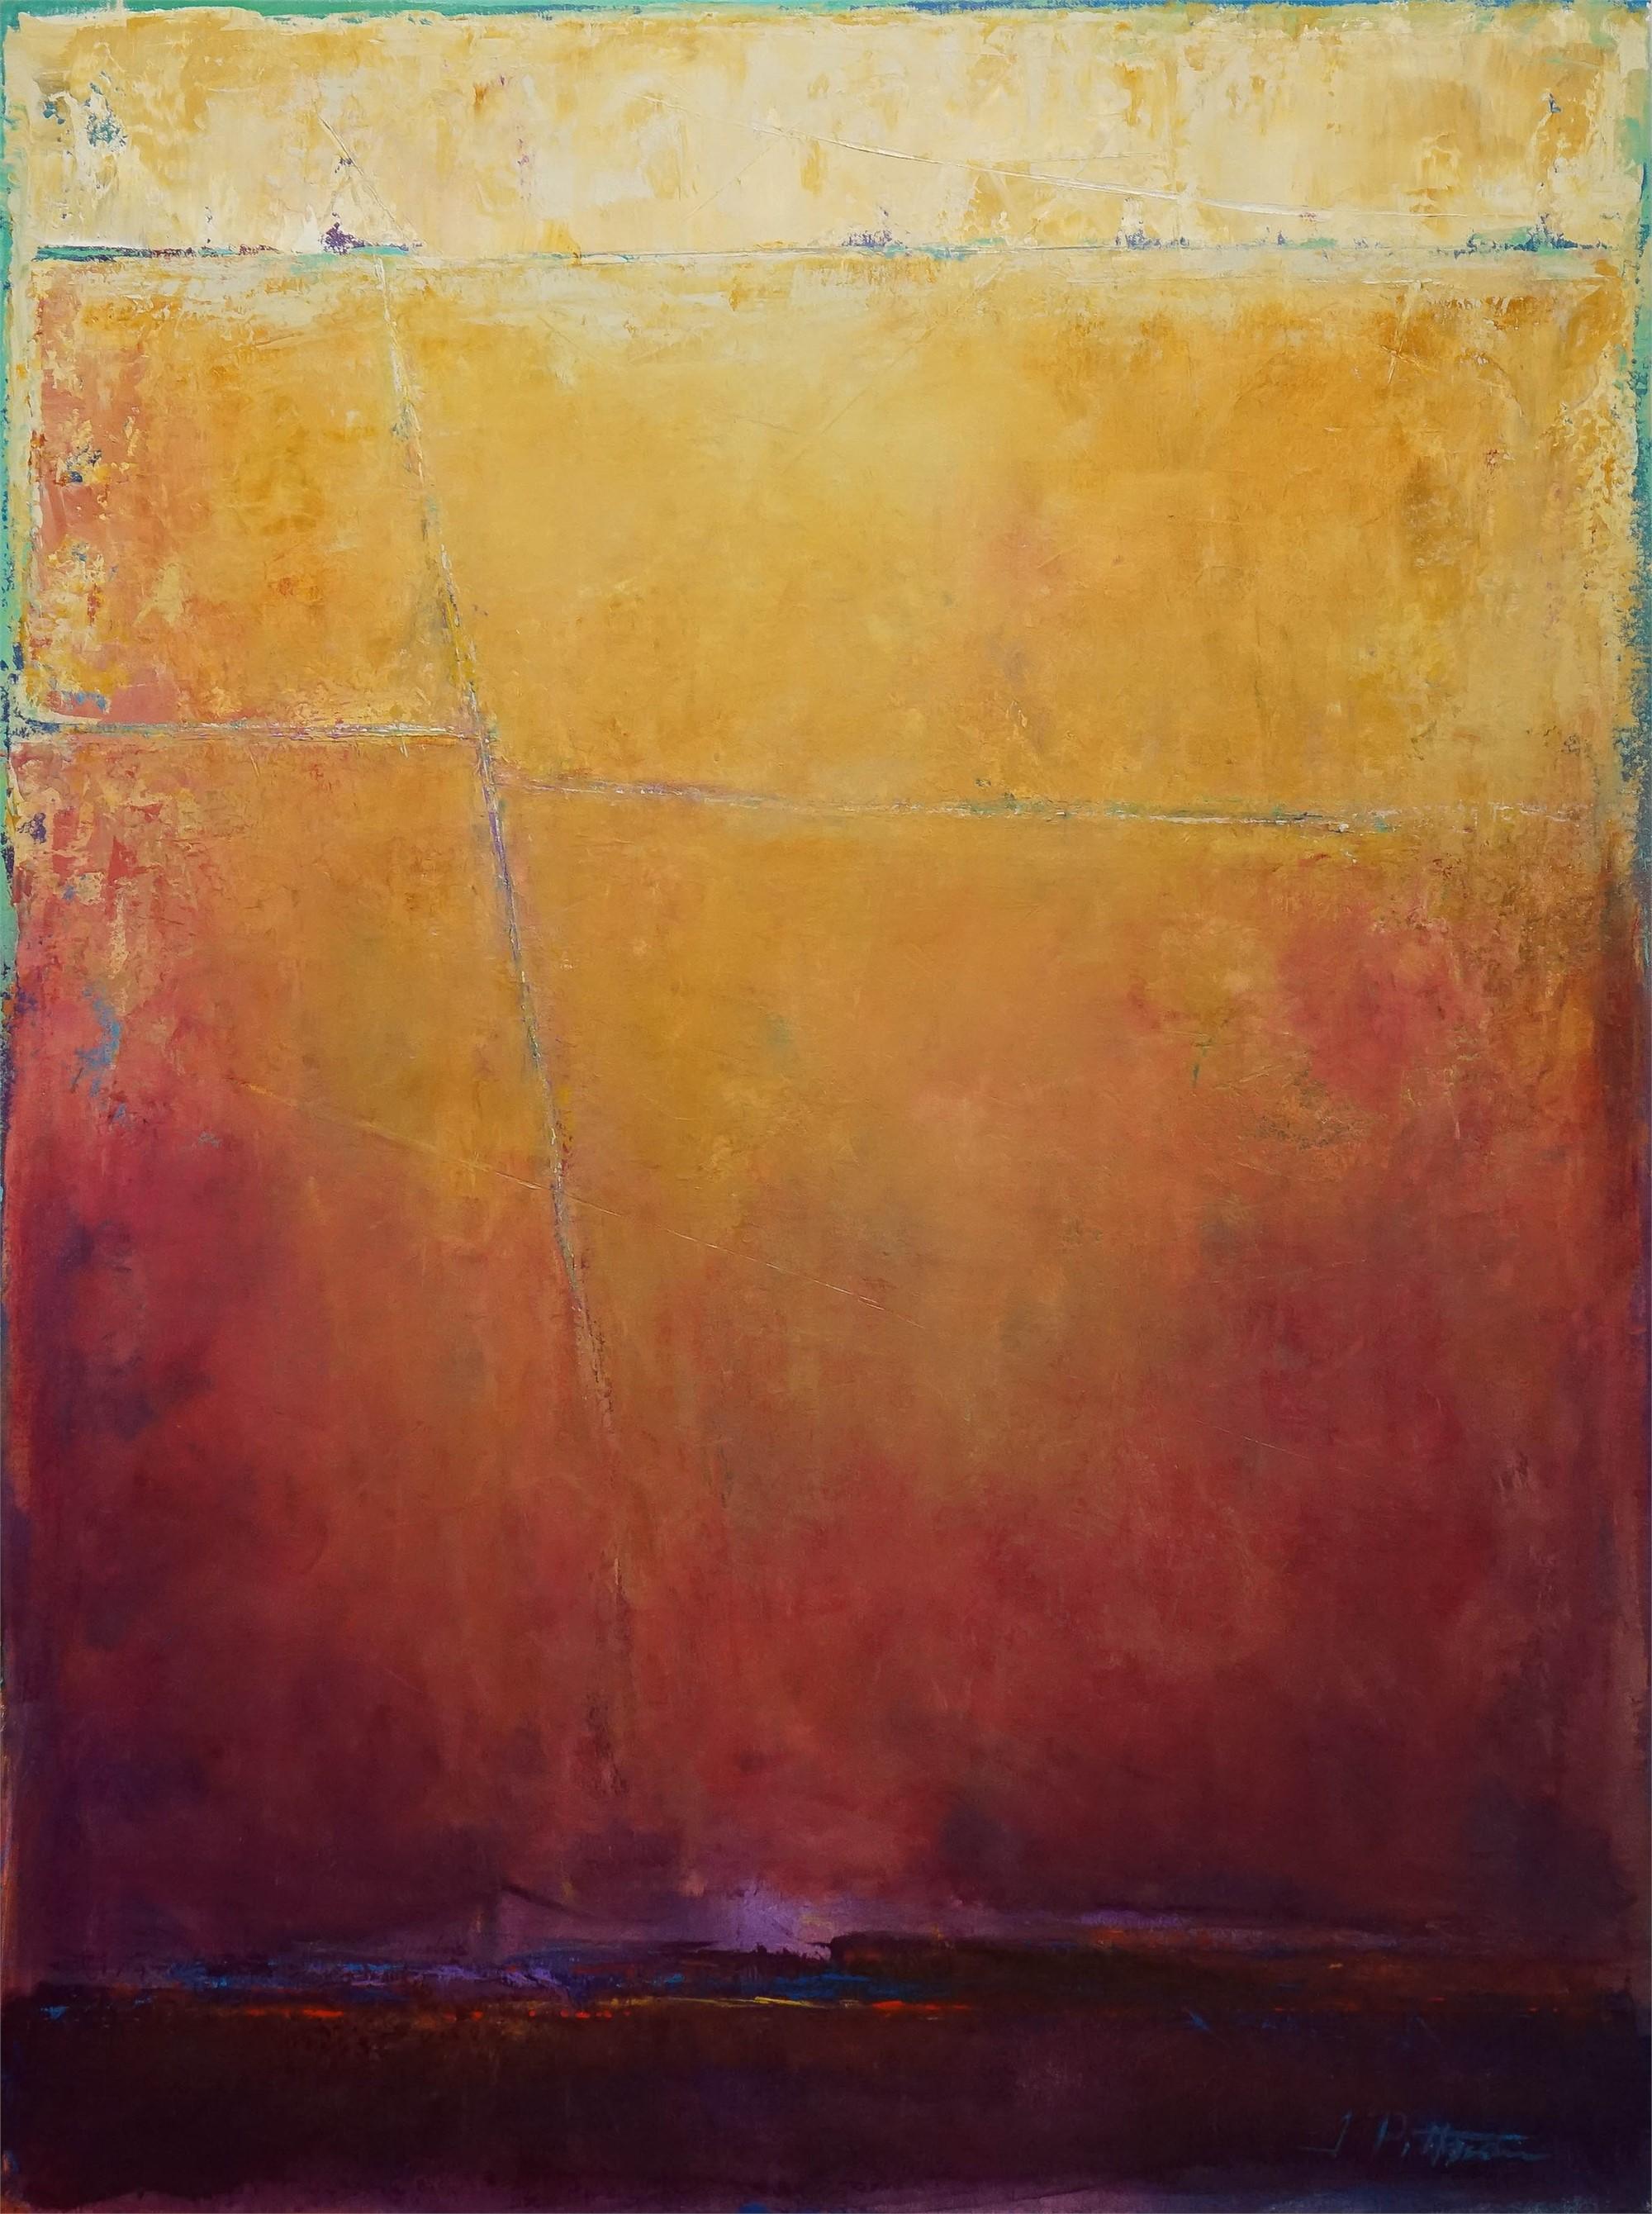 Four Corners by Jim Pittman